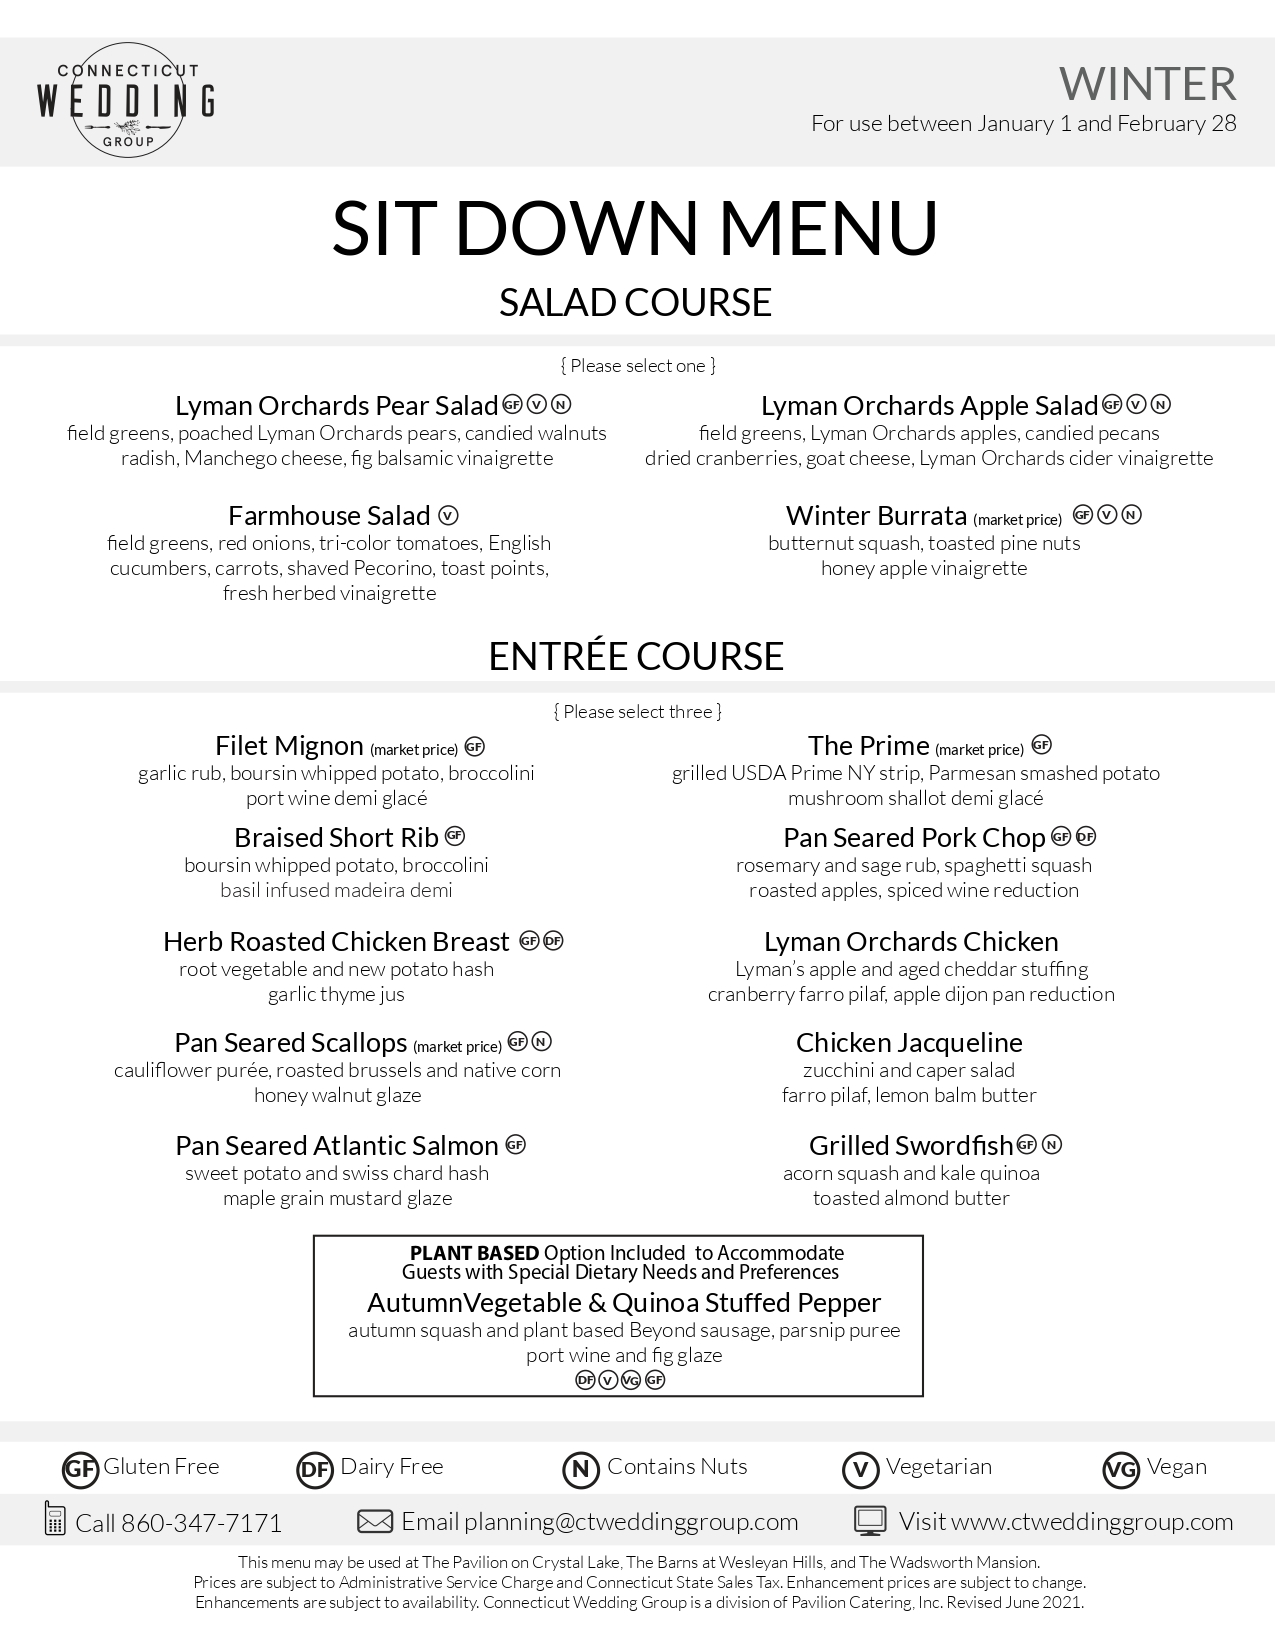 Winter-Sit-Down-Buffet-Menu-2022_page-0001-1